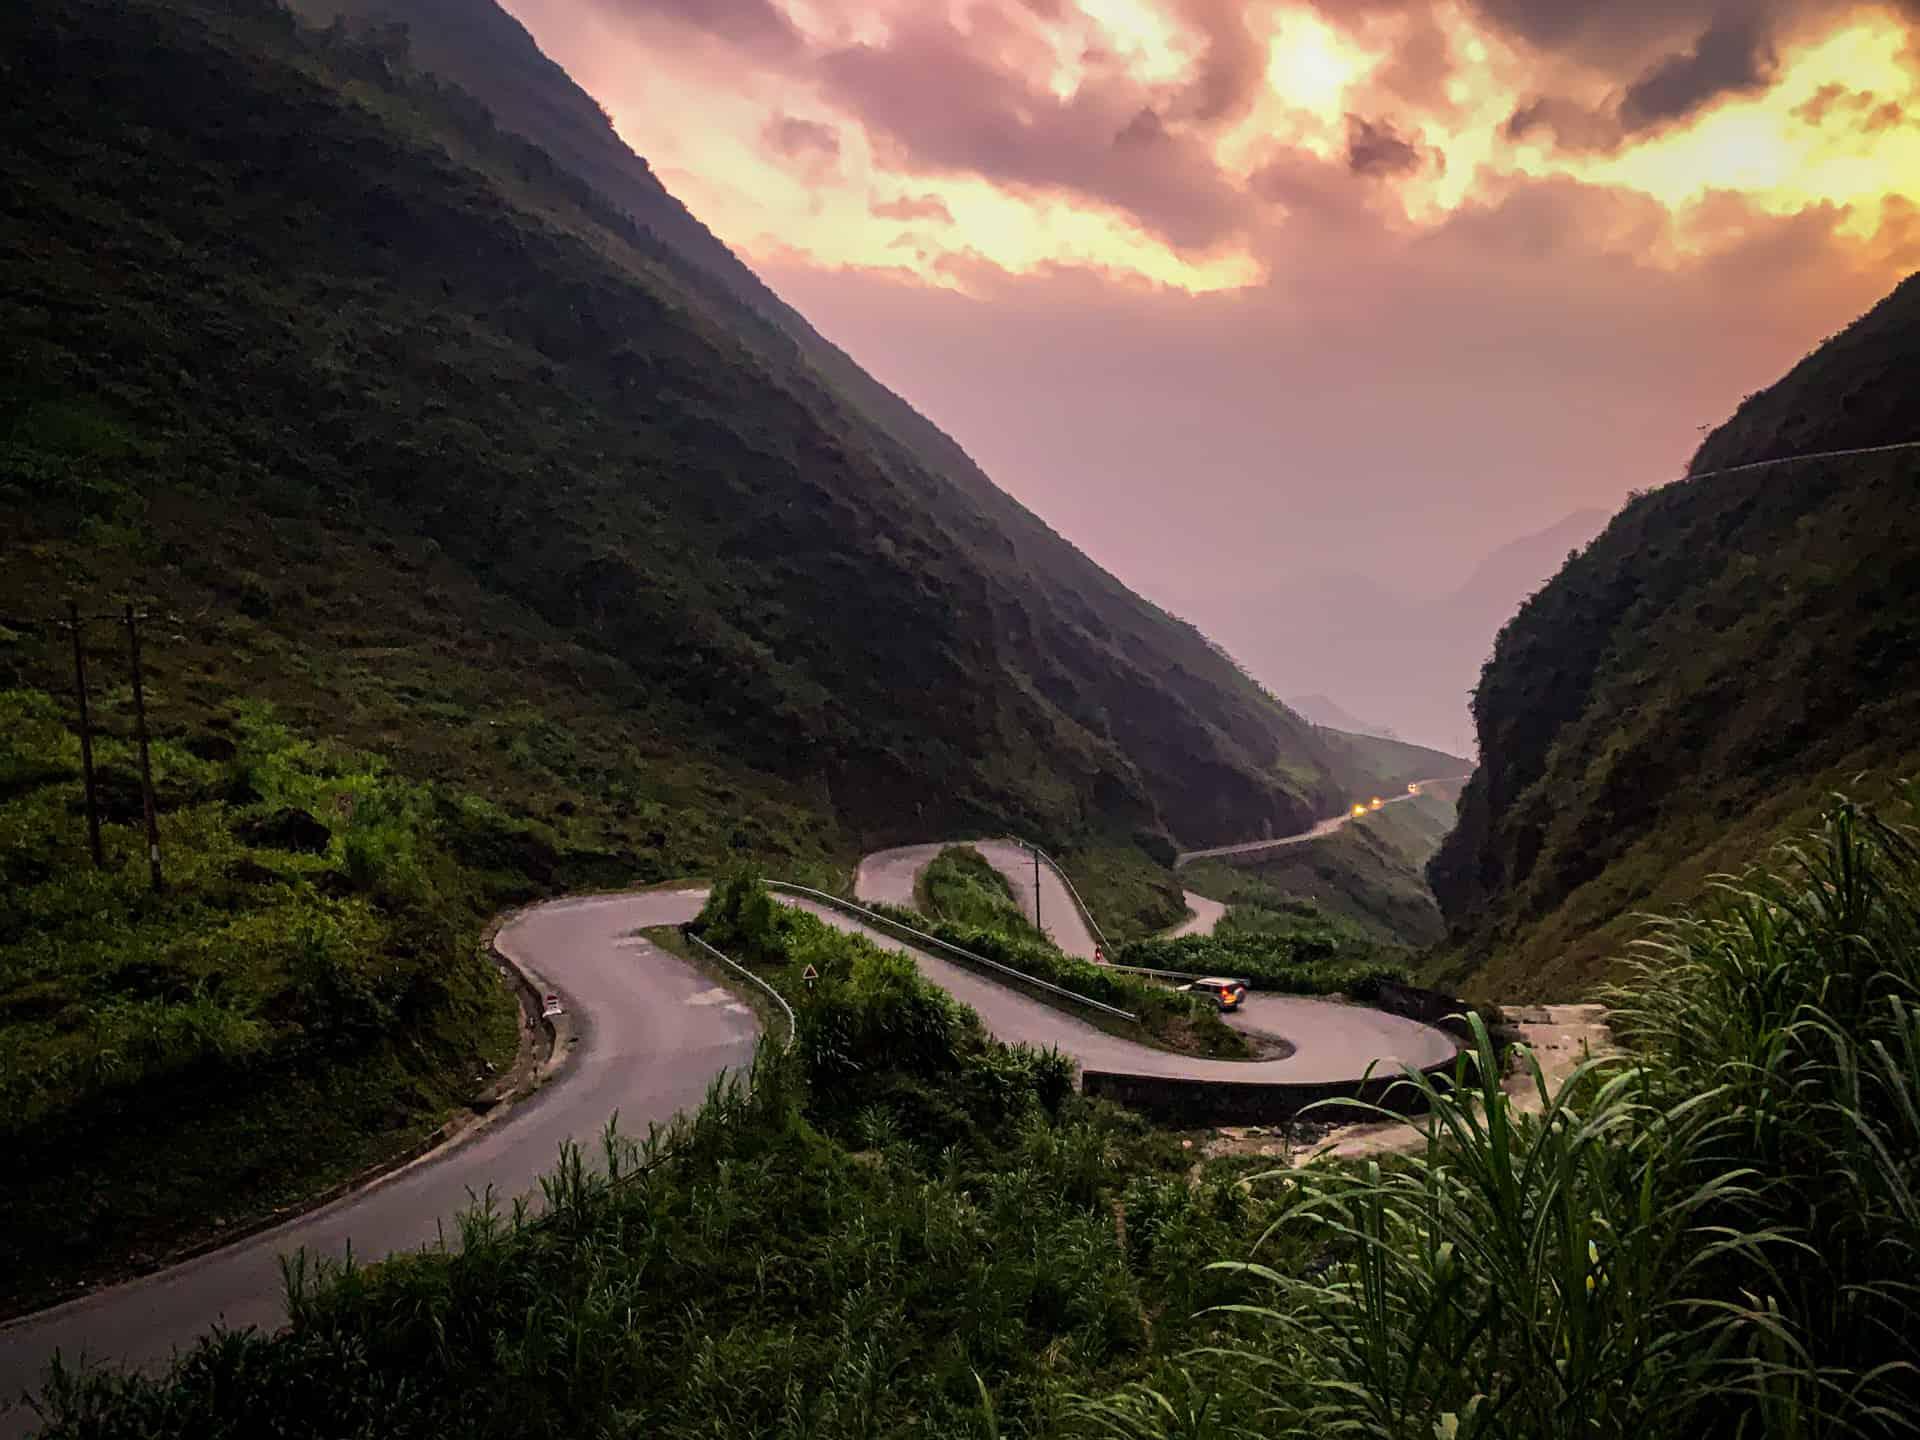 Winding road at sunset Ha Giang Motorbike loop